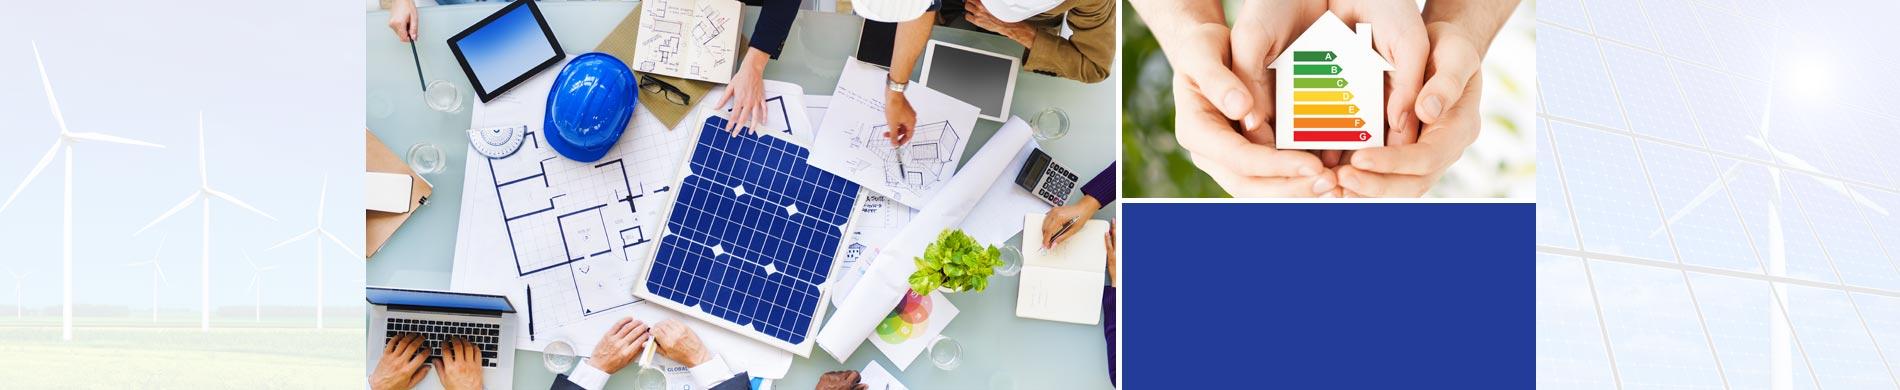 CEI NI Ltd - Energy Solutions